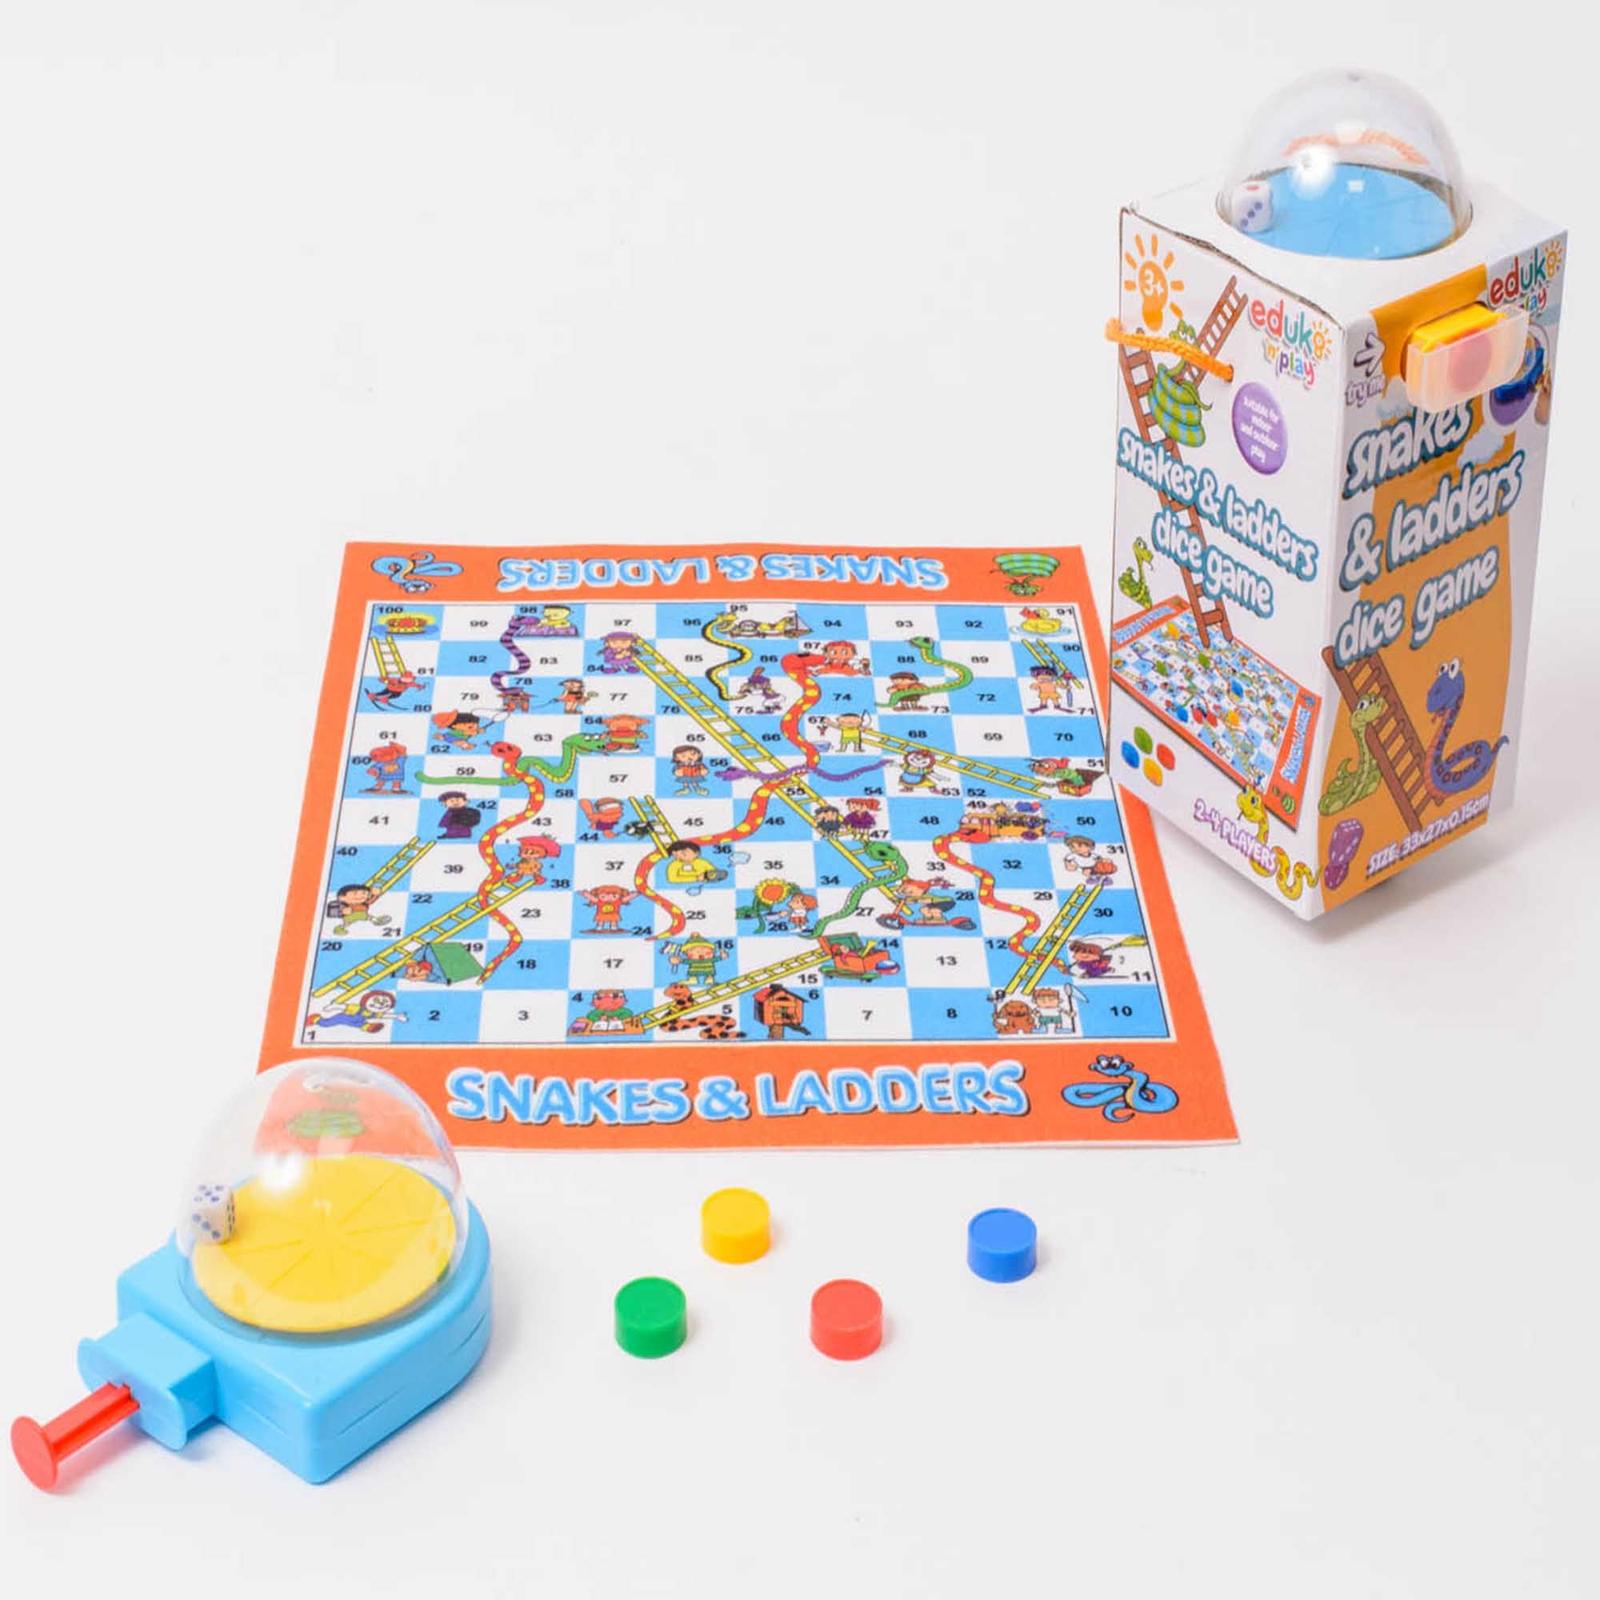 Mini Dice Games Offer